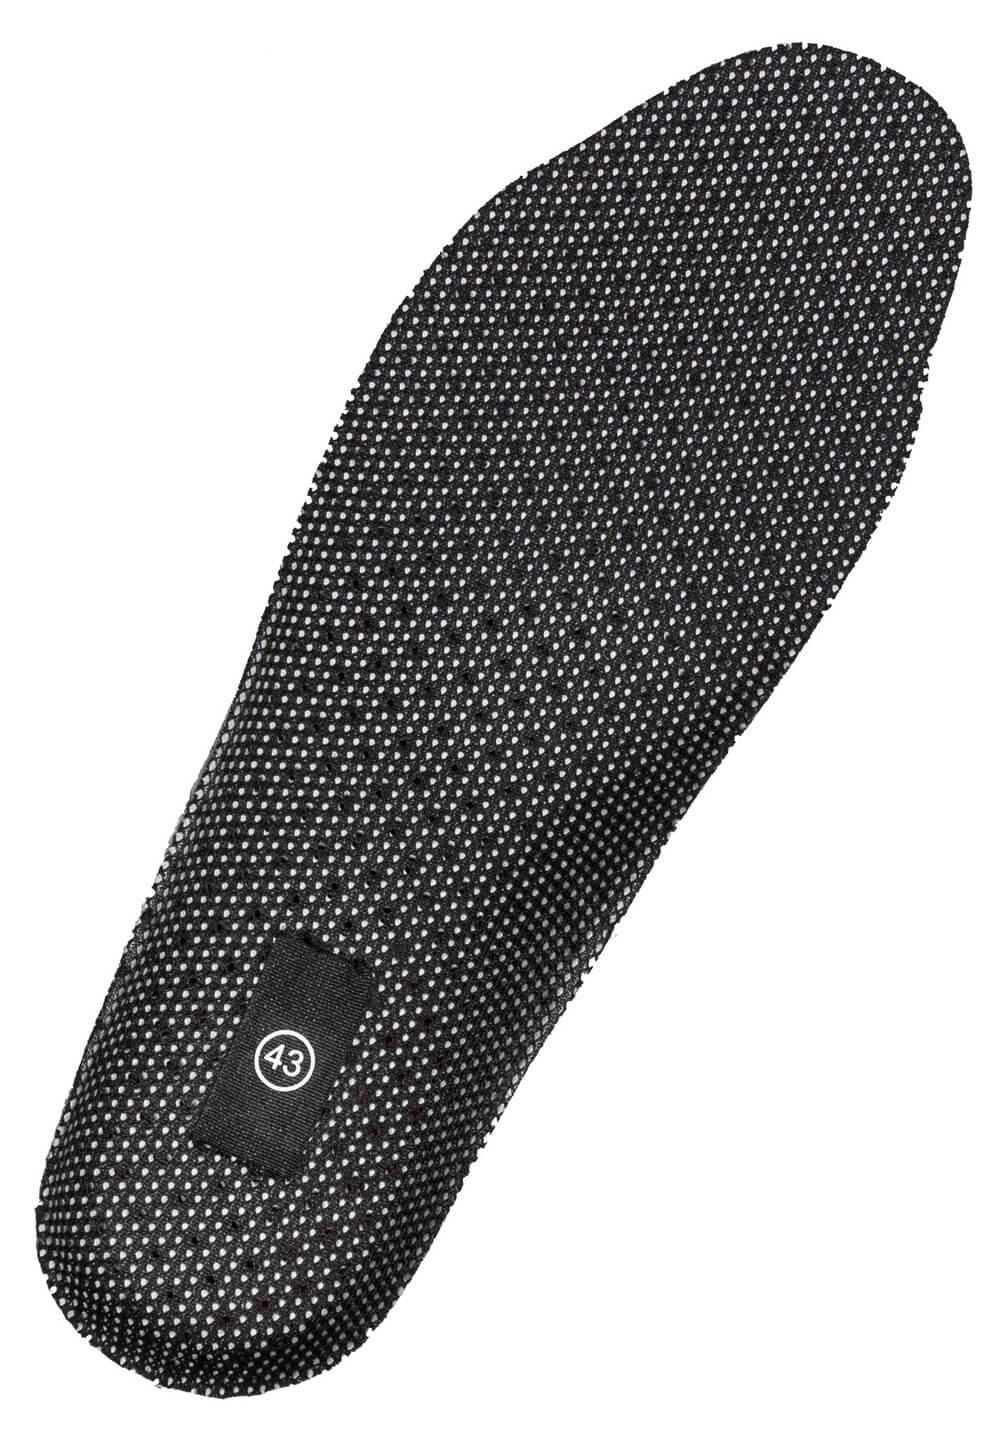 FT086-980-09 Inlegzolen - zwart